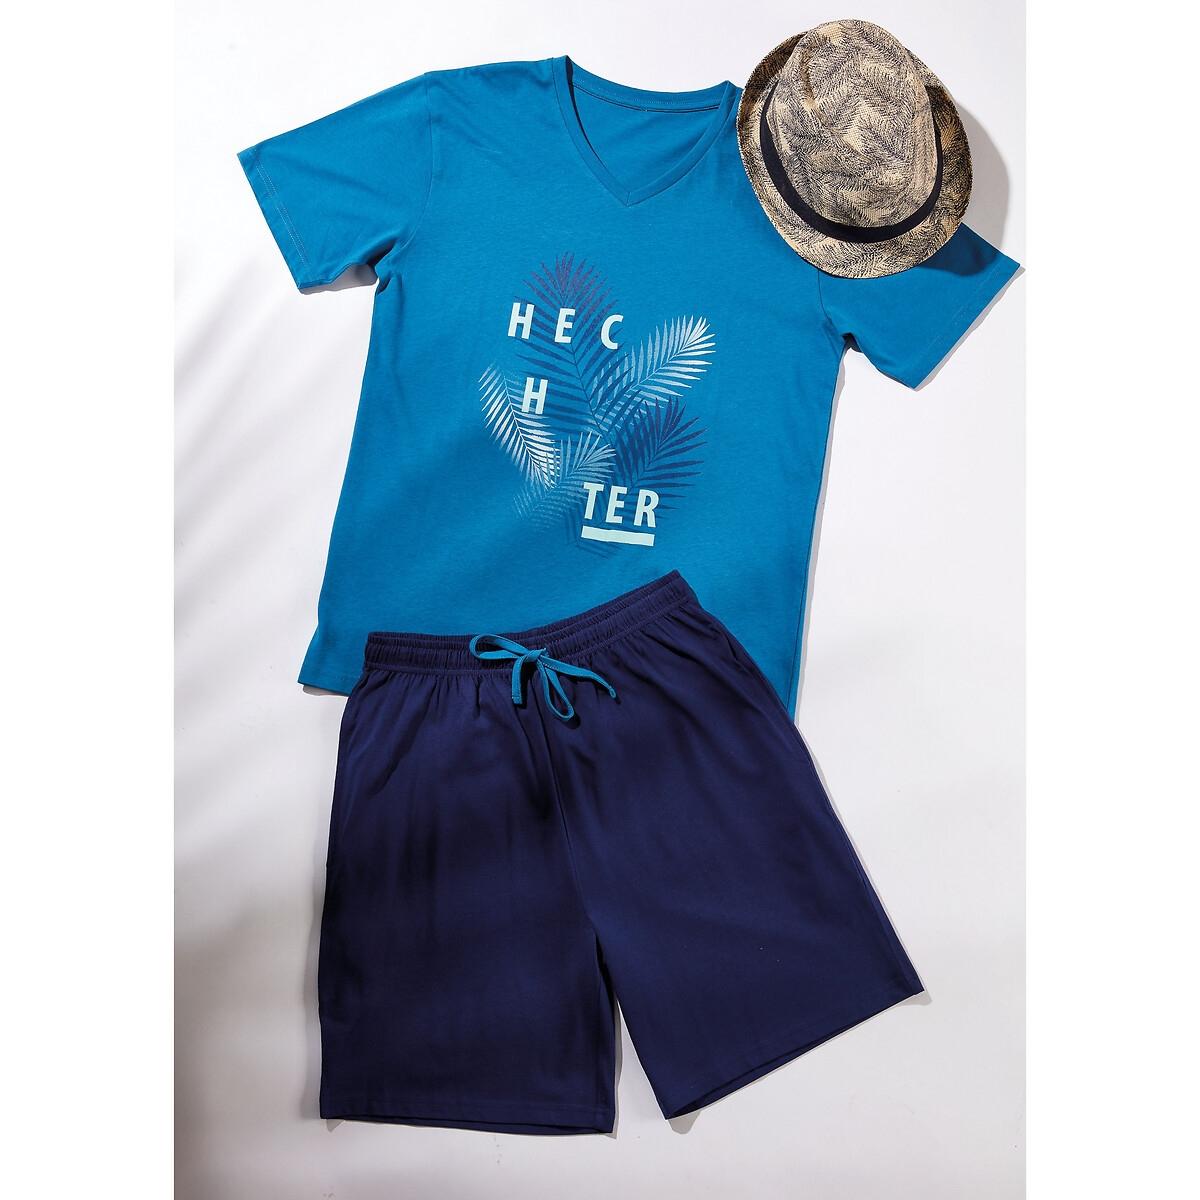 Фото - Пижама LaRedoute С шортами L синий пижама laredoute с шортами в полоску m синий